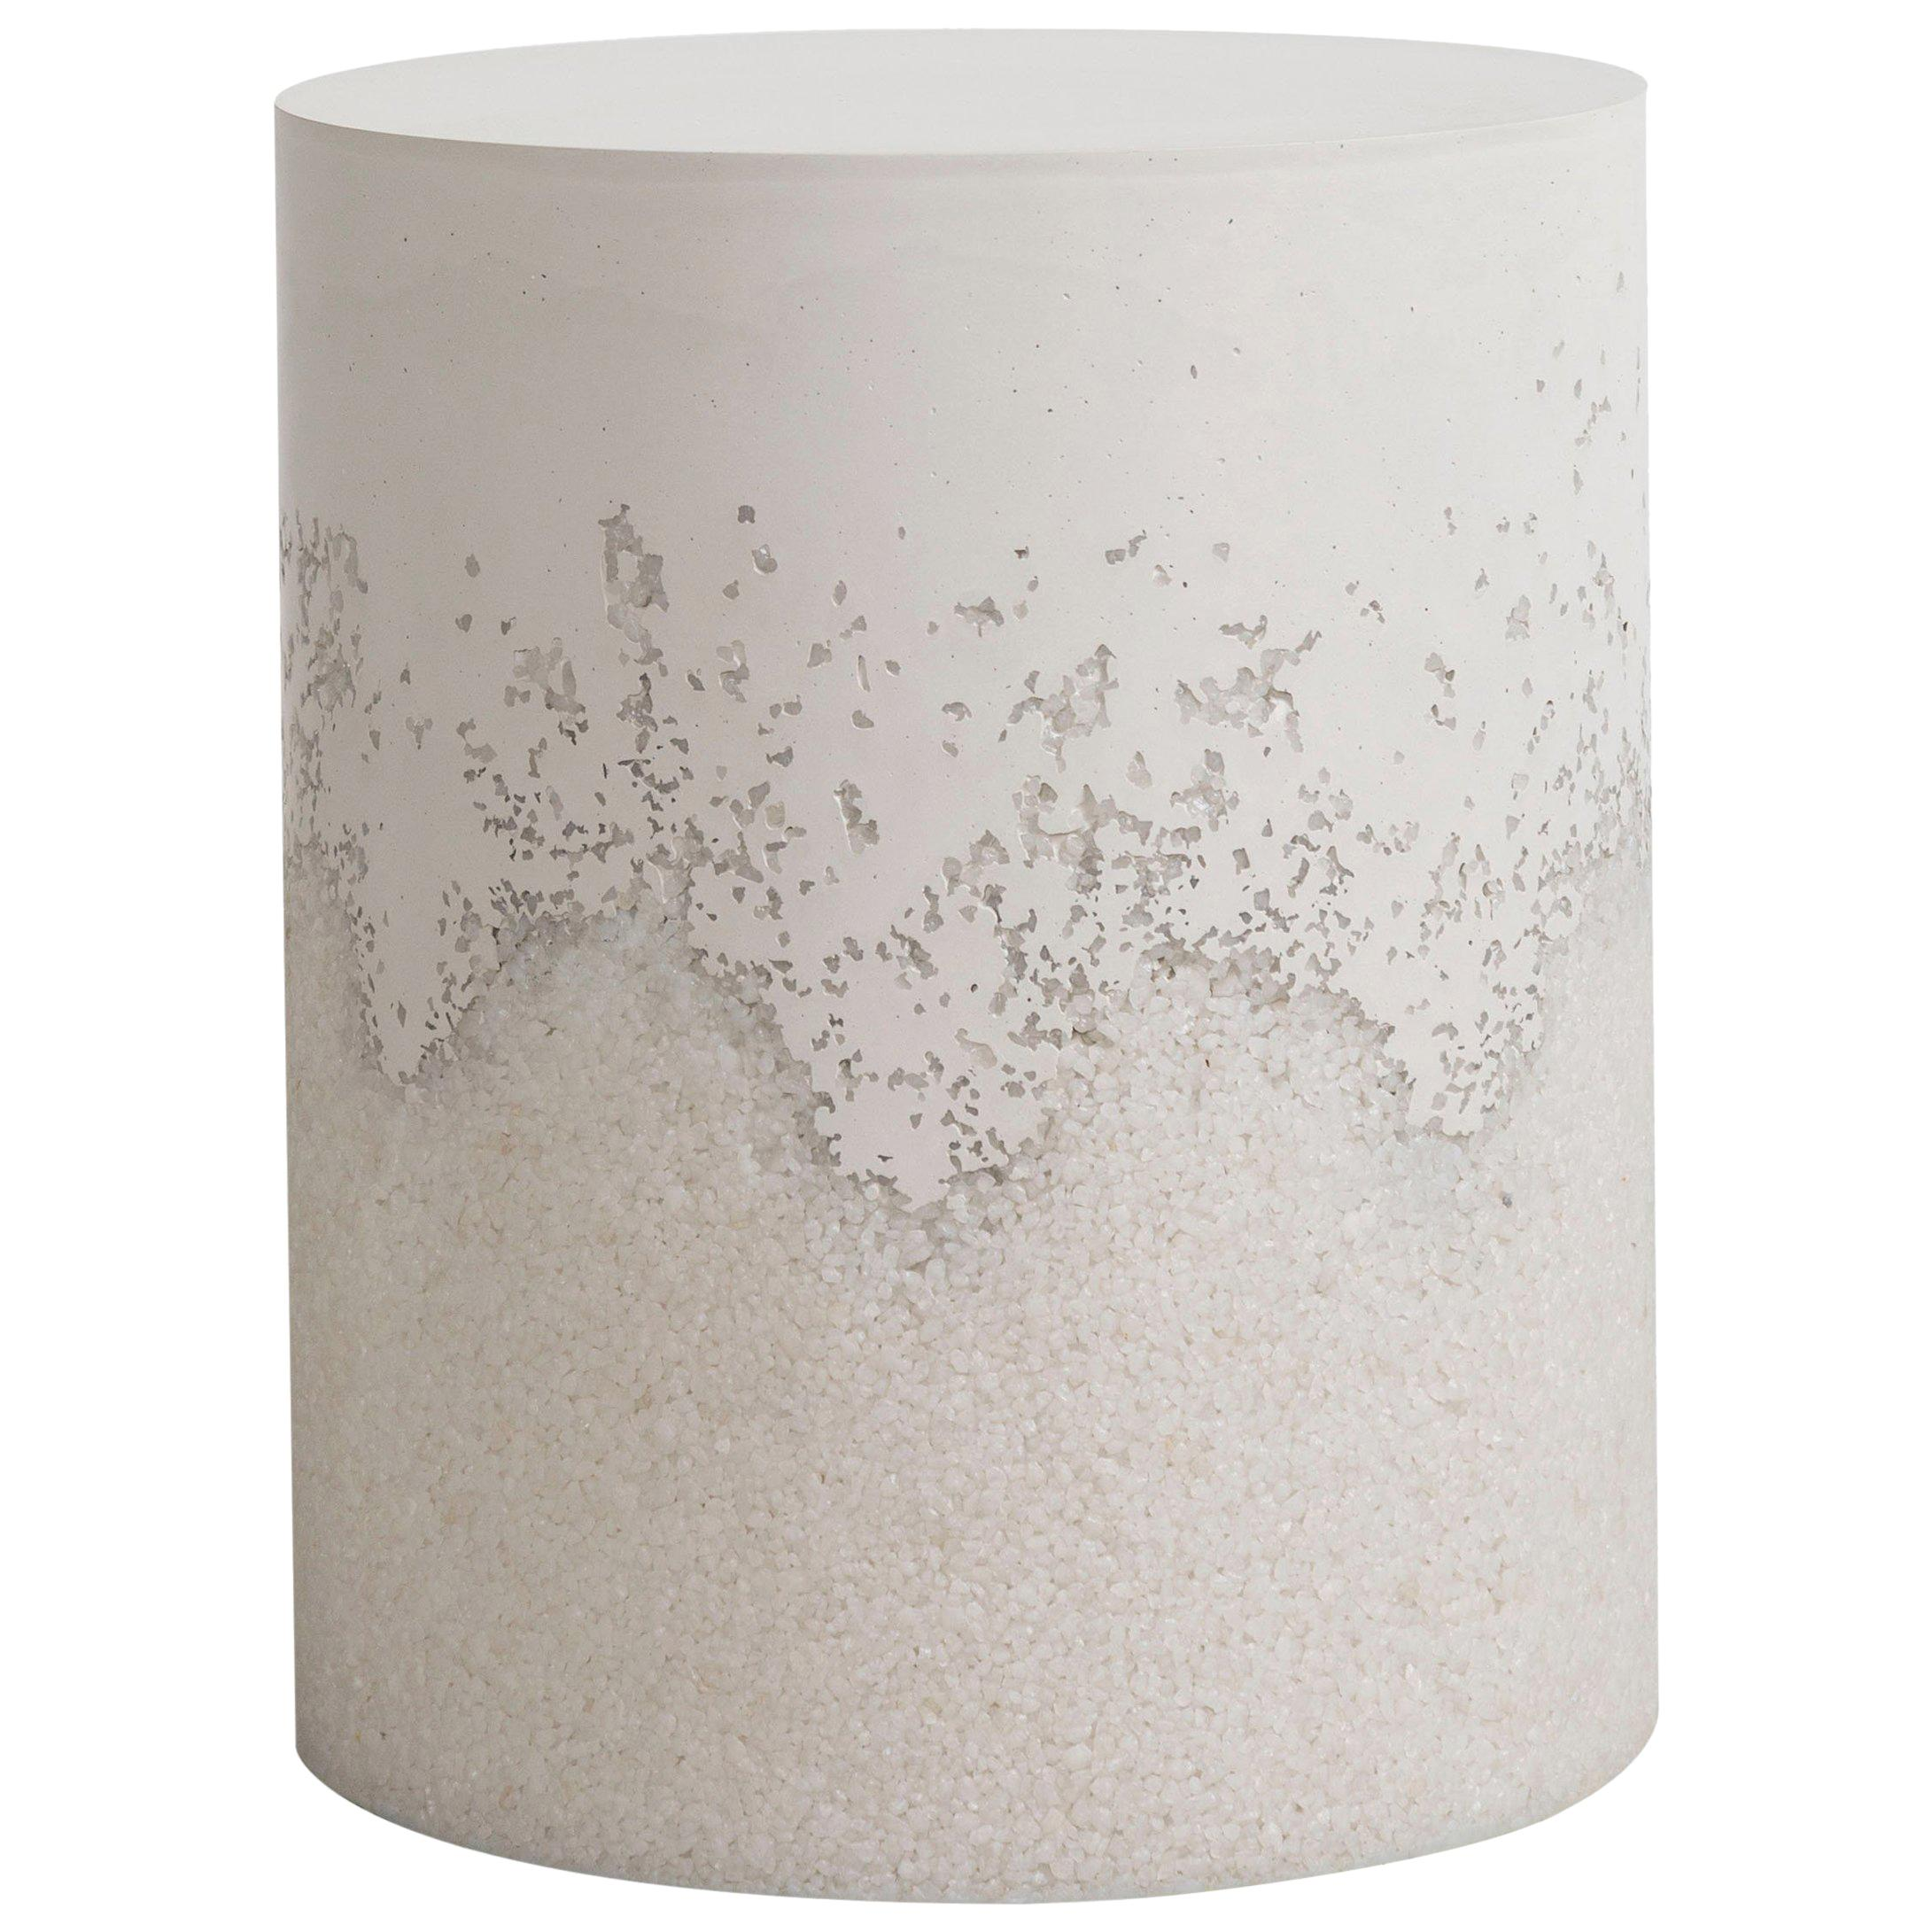 Drum, White Cement and Crystal Quartz by Fernando Mastrangelo, New York